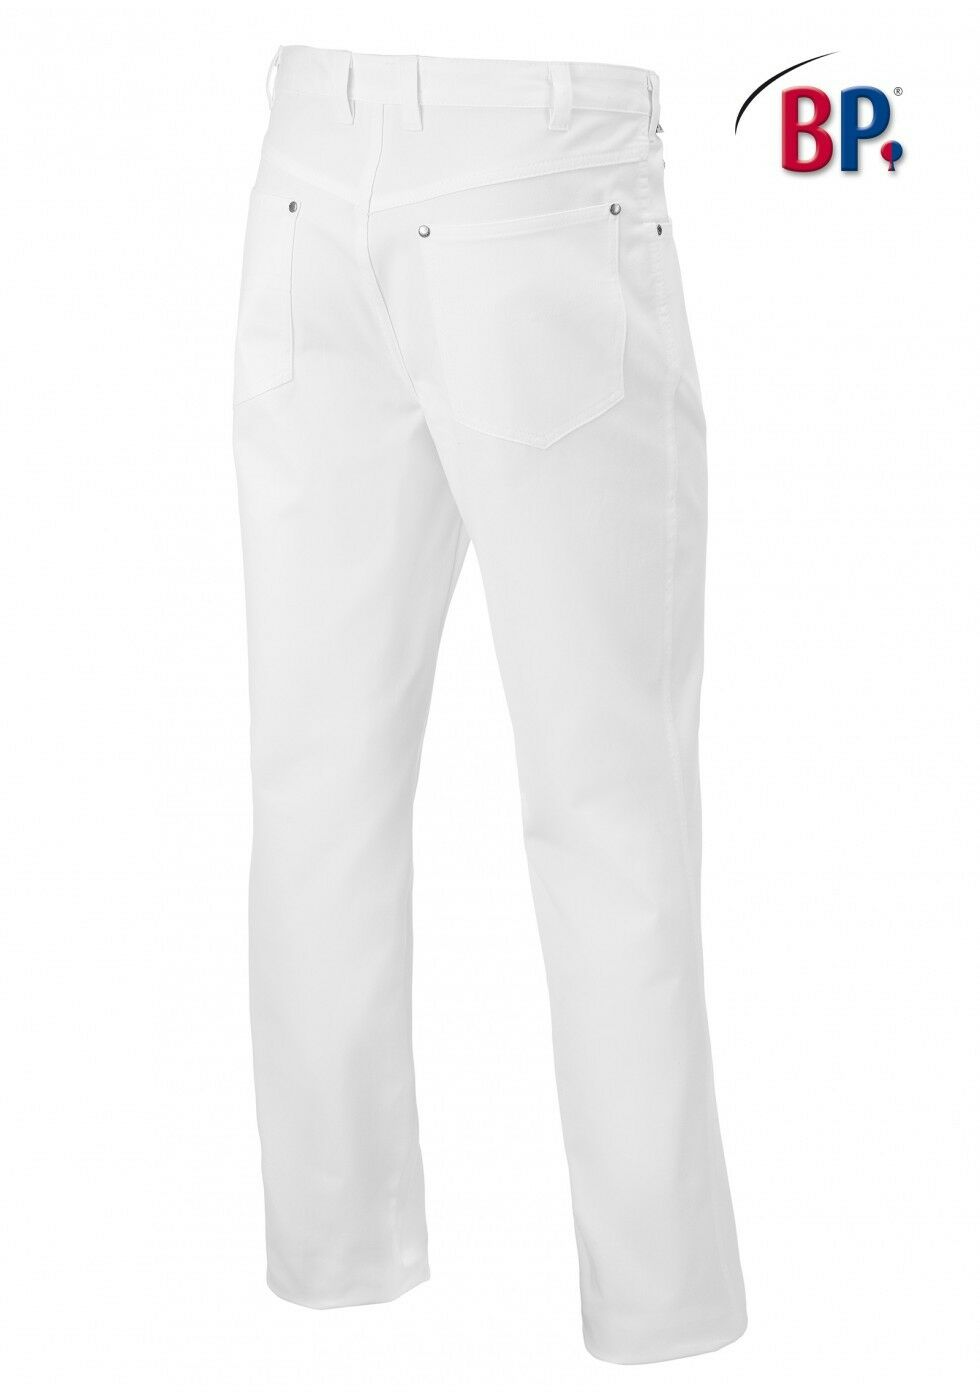 BP Jeans Jeans Jeans Uomo Stretch 1378 690 21 bianco medico Jeans Pantaloni Pantaloni Lavoro Uomo 24-114 628222